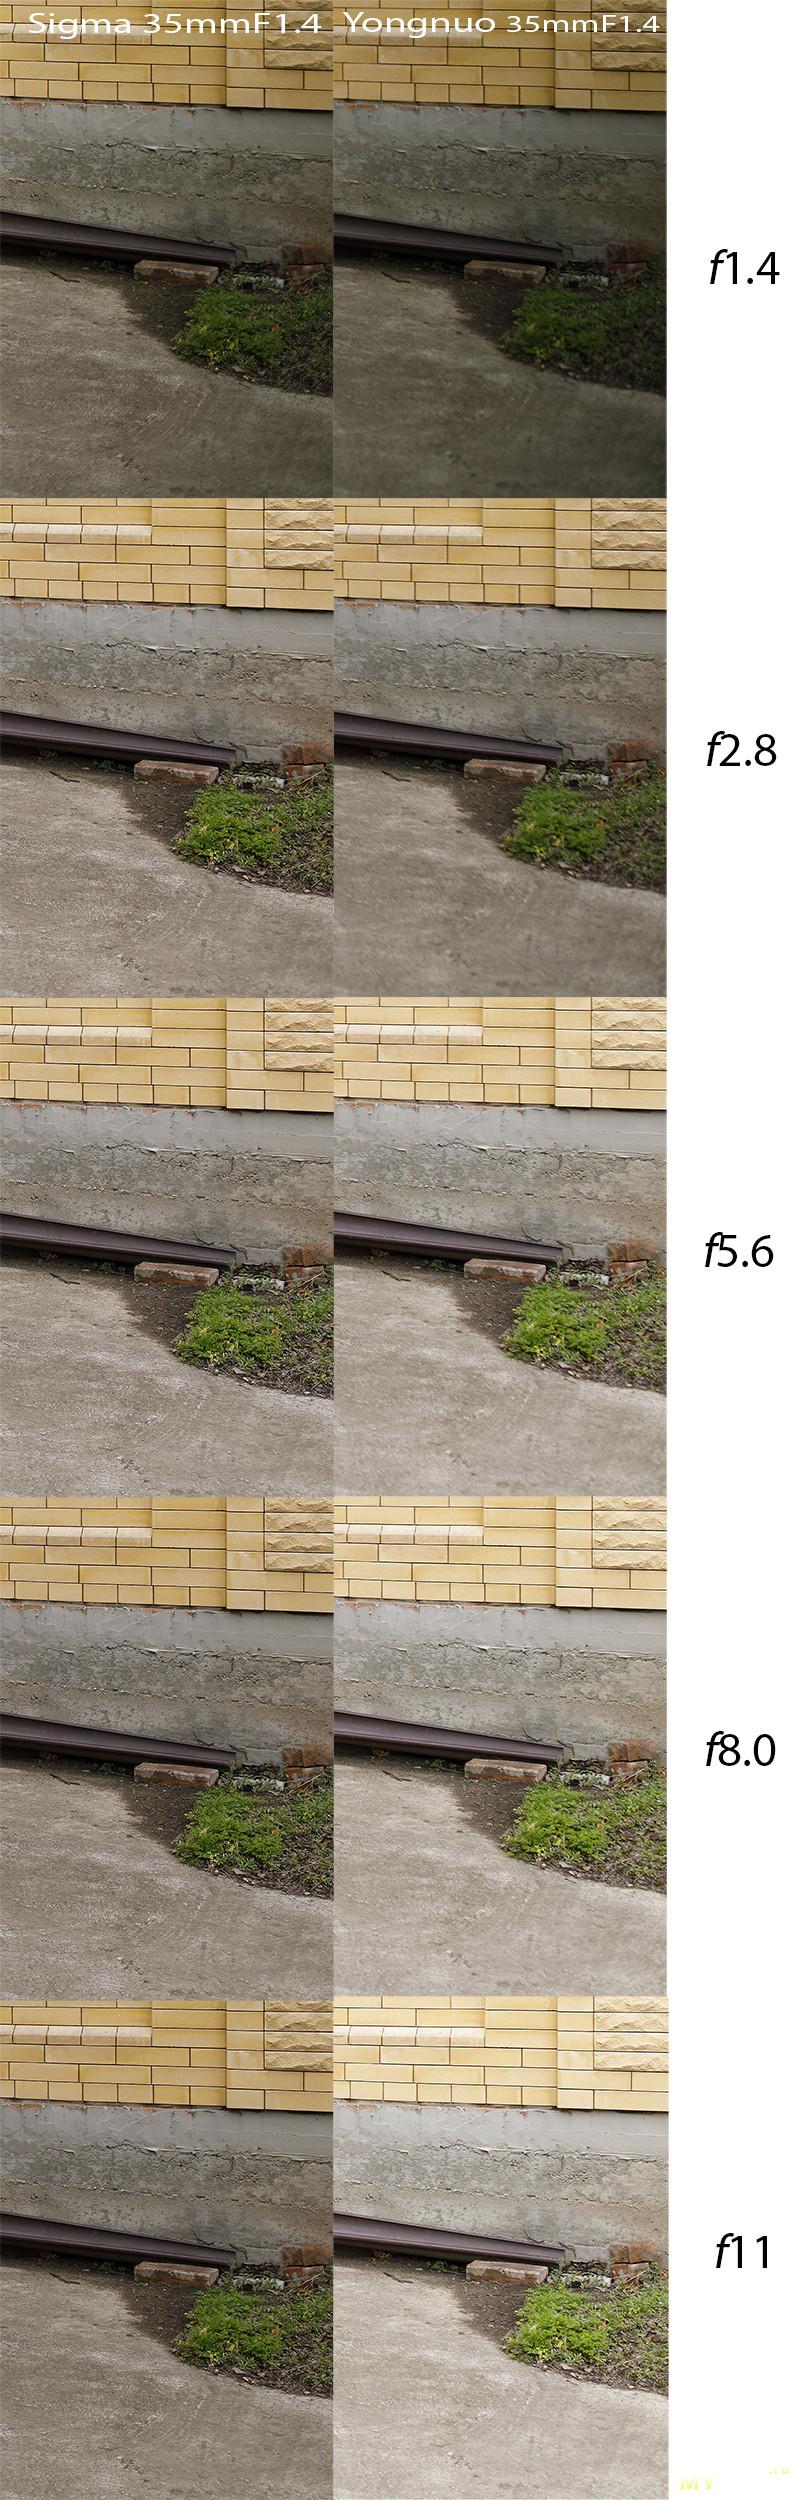 "Yongnuo YN35mmF1.4 - очередная ""L""-ка от китайцев?"